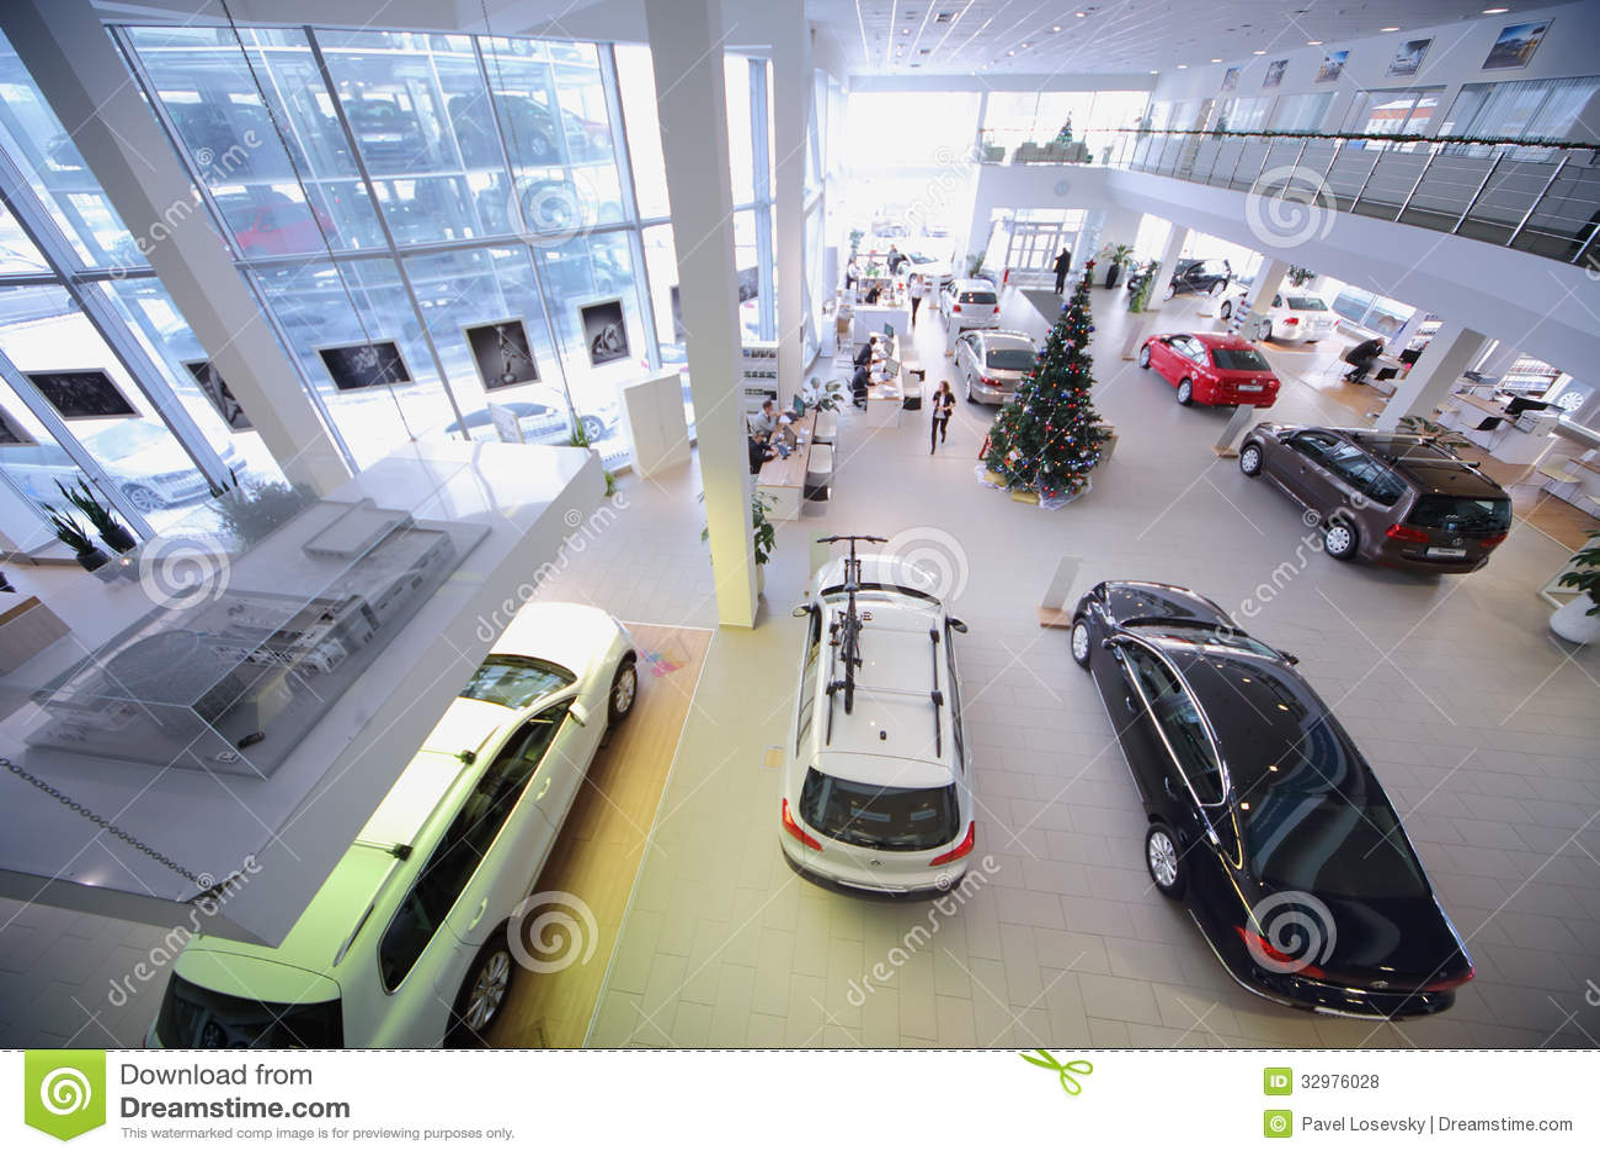 used values recalls volkswagen dealerships software garage scandal updates photo update vw photos dealers recall images alamy stock secondhand dealer